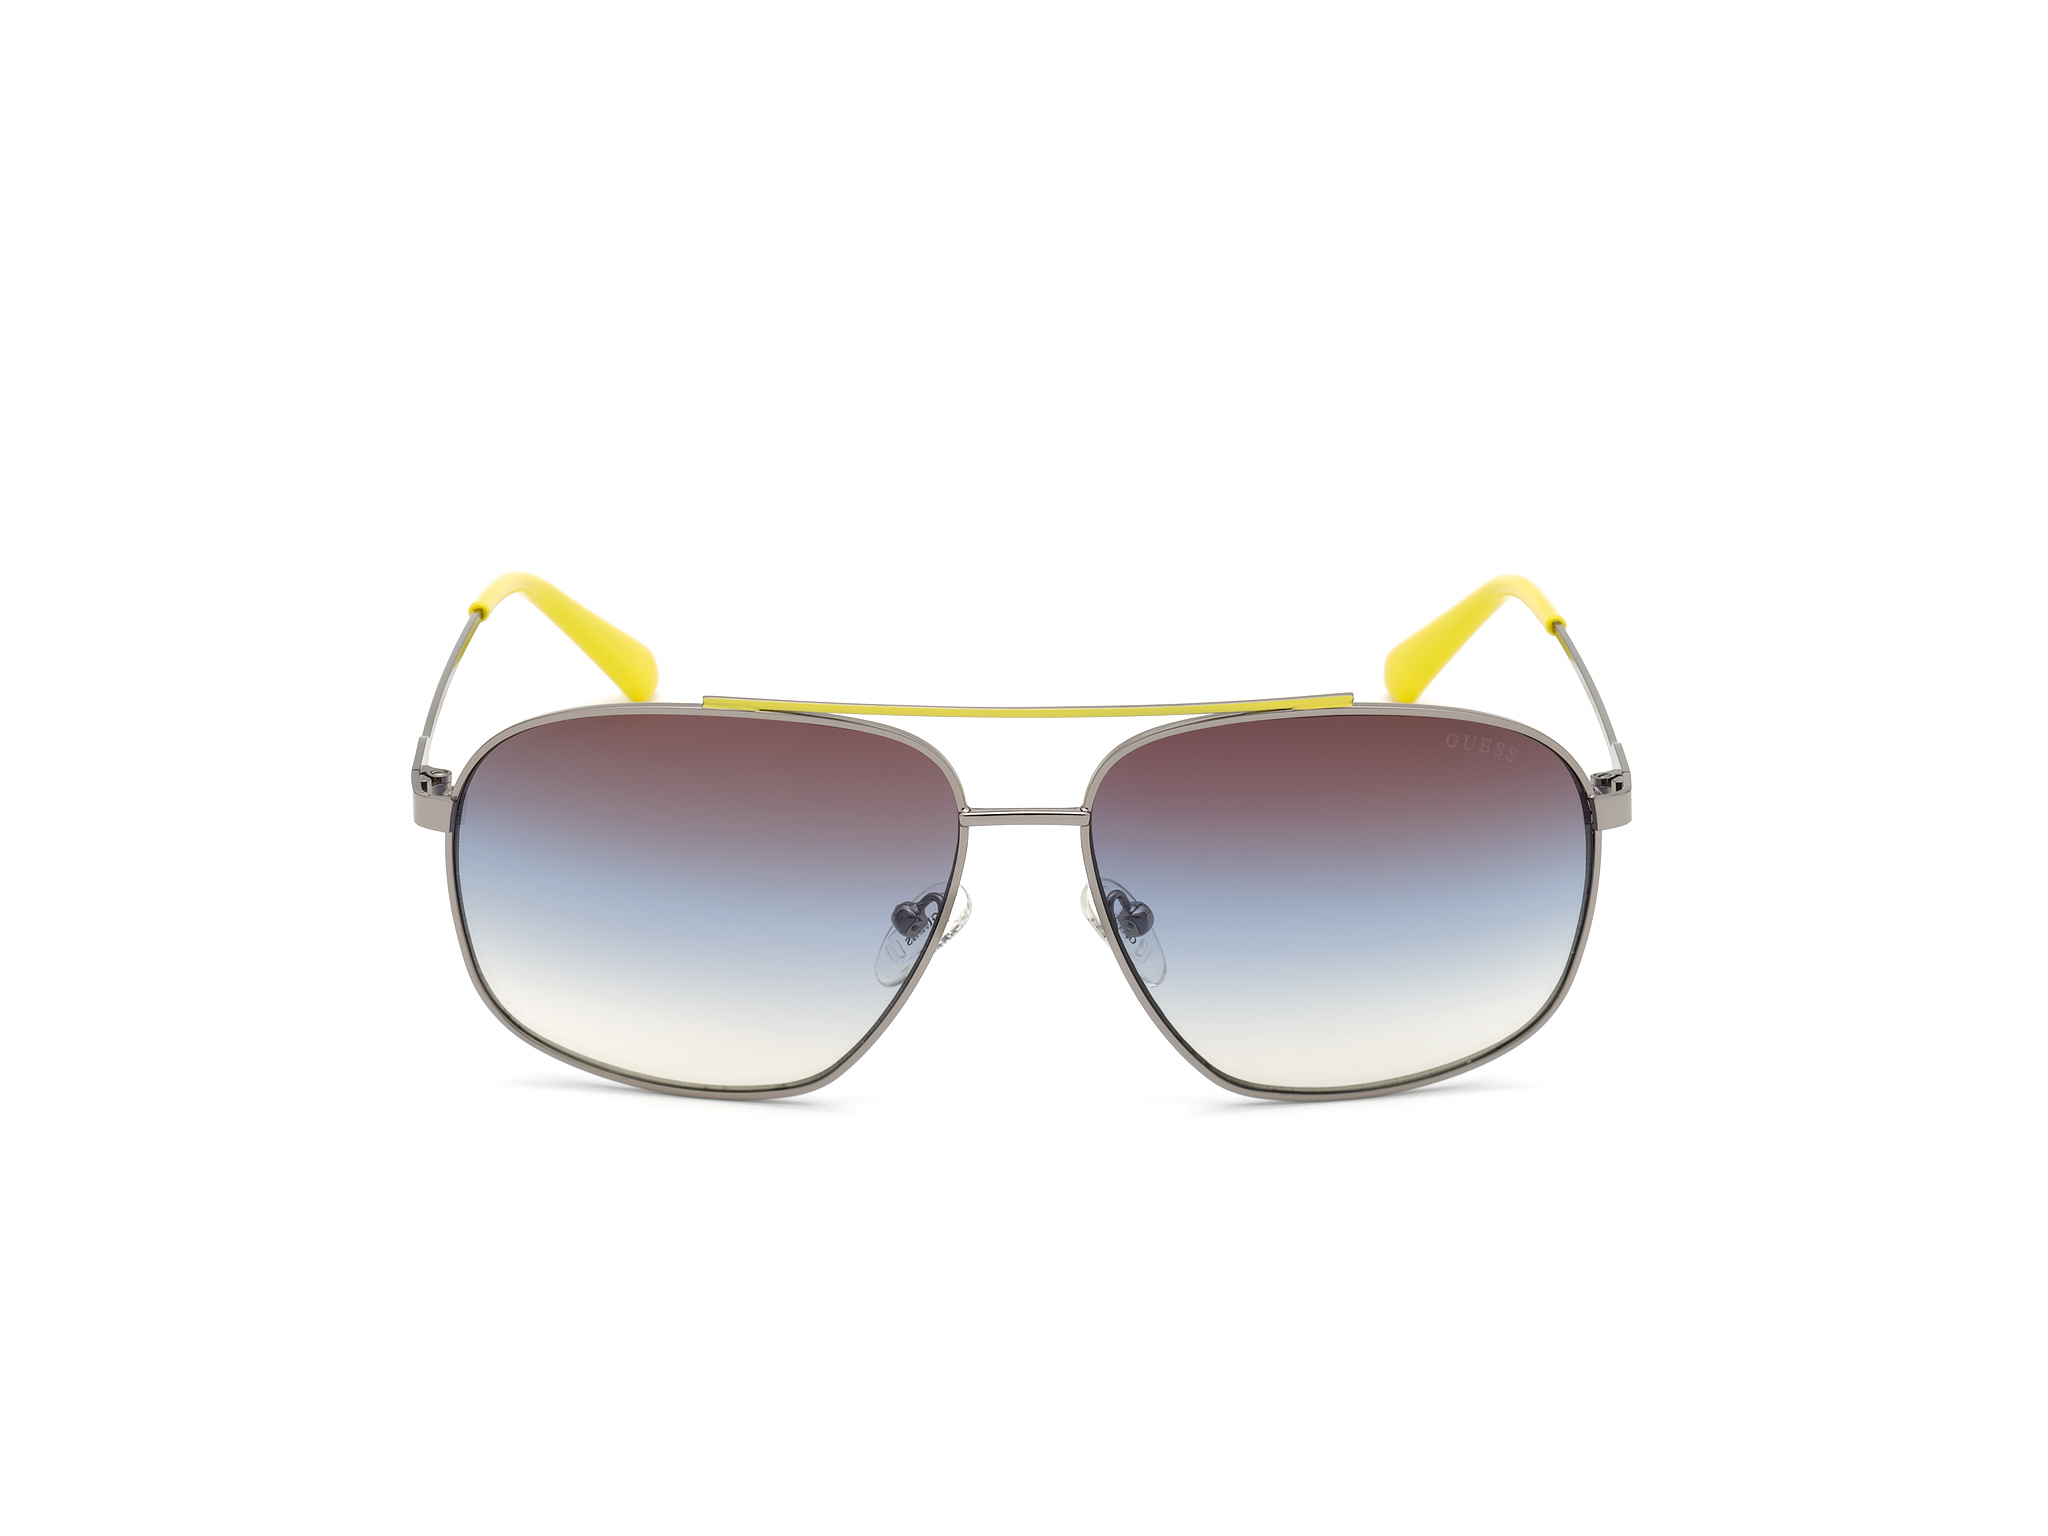 GUESS | Guess Brown Frame With Multi Lens Aviator Shape Men Sunglass